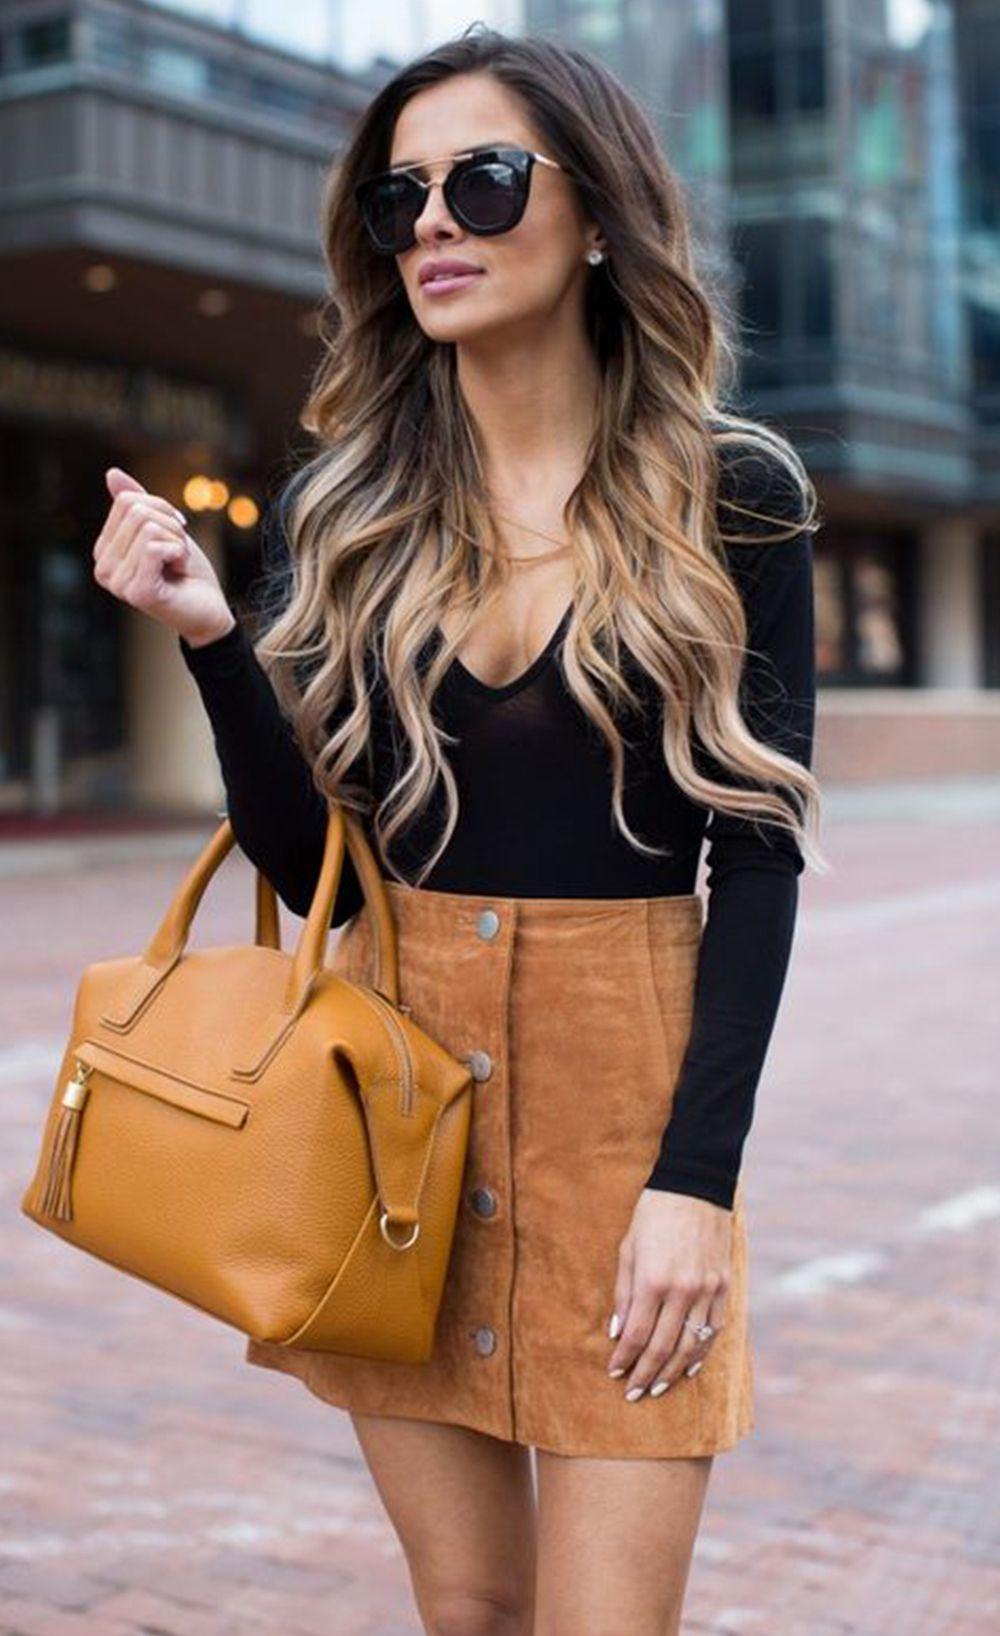 39.99 Vintage Fashion Corduroy High Waist Mini Skirt  799c9844b